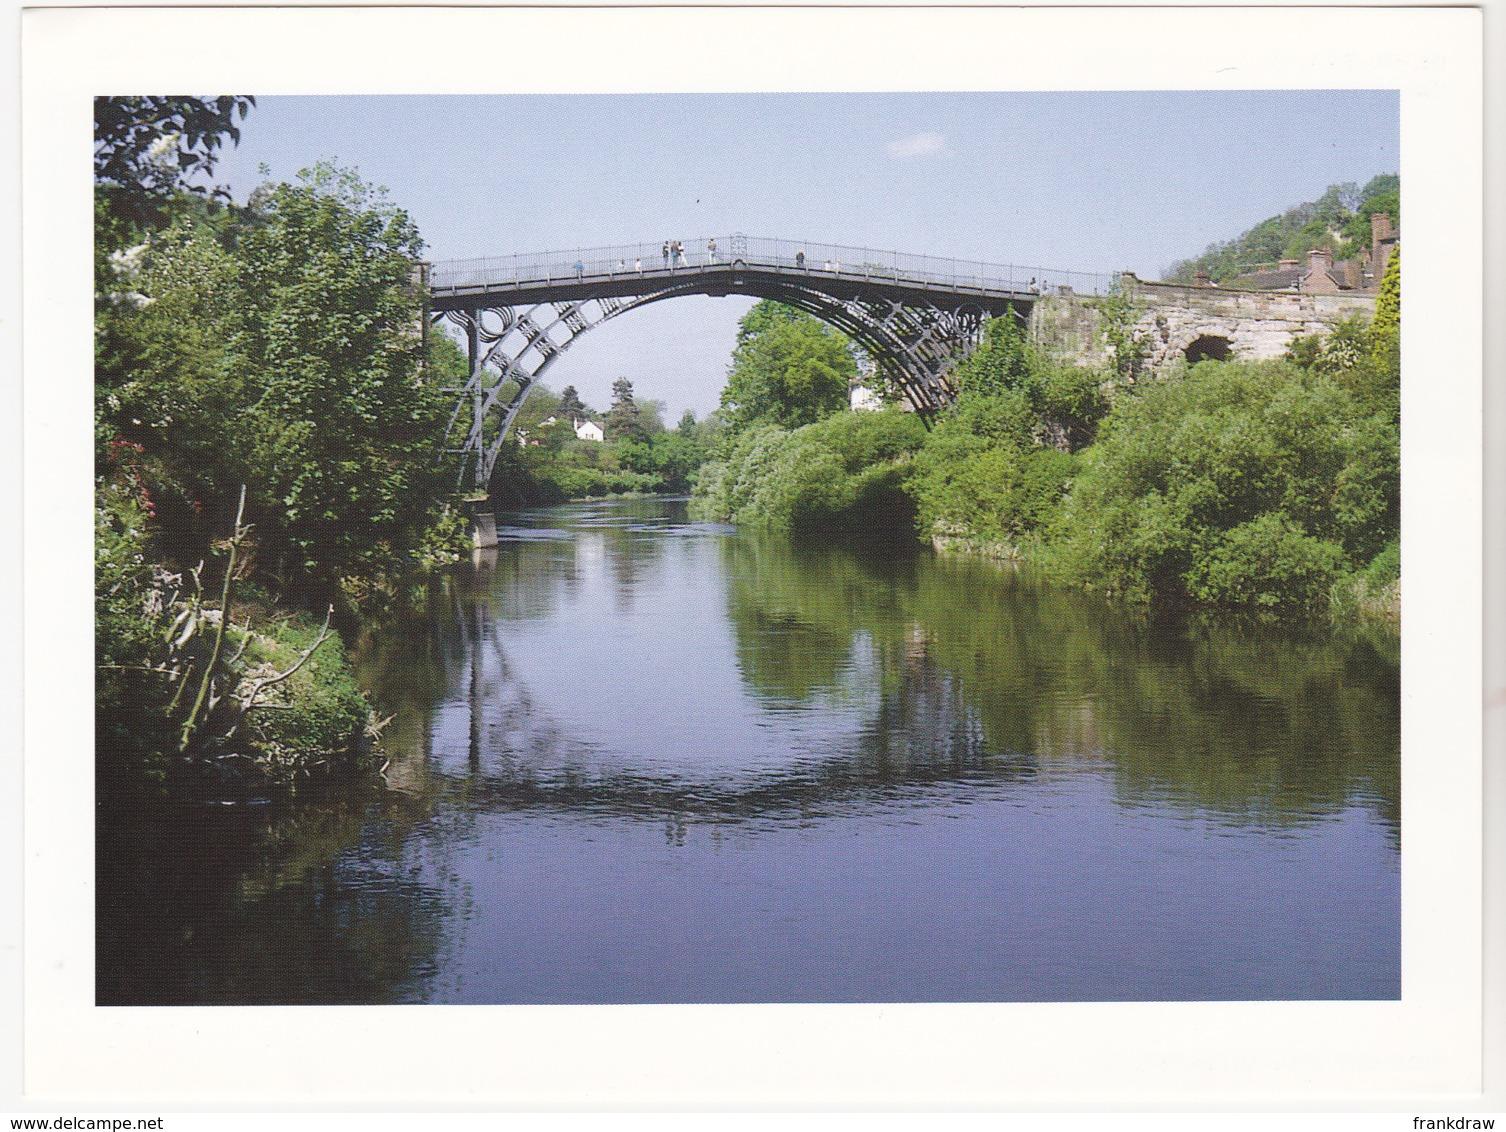 Postcard - Iron Bridge Over The River Severn, Shropshire - Photo By Ivan J Belcher - VG - Unclassified